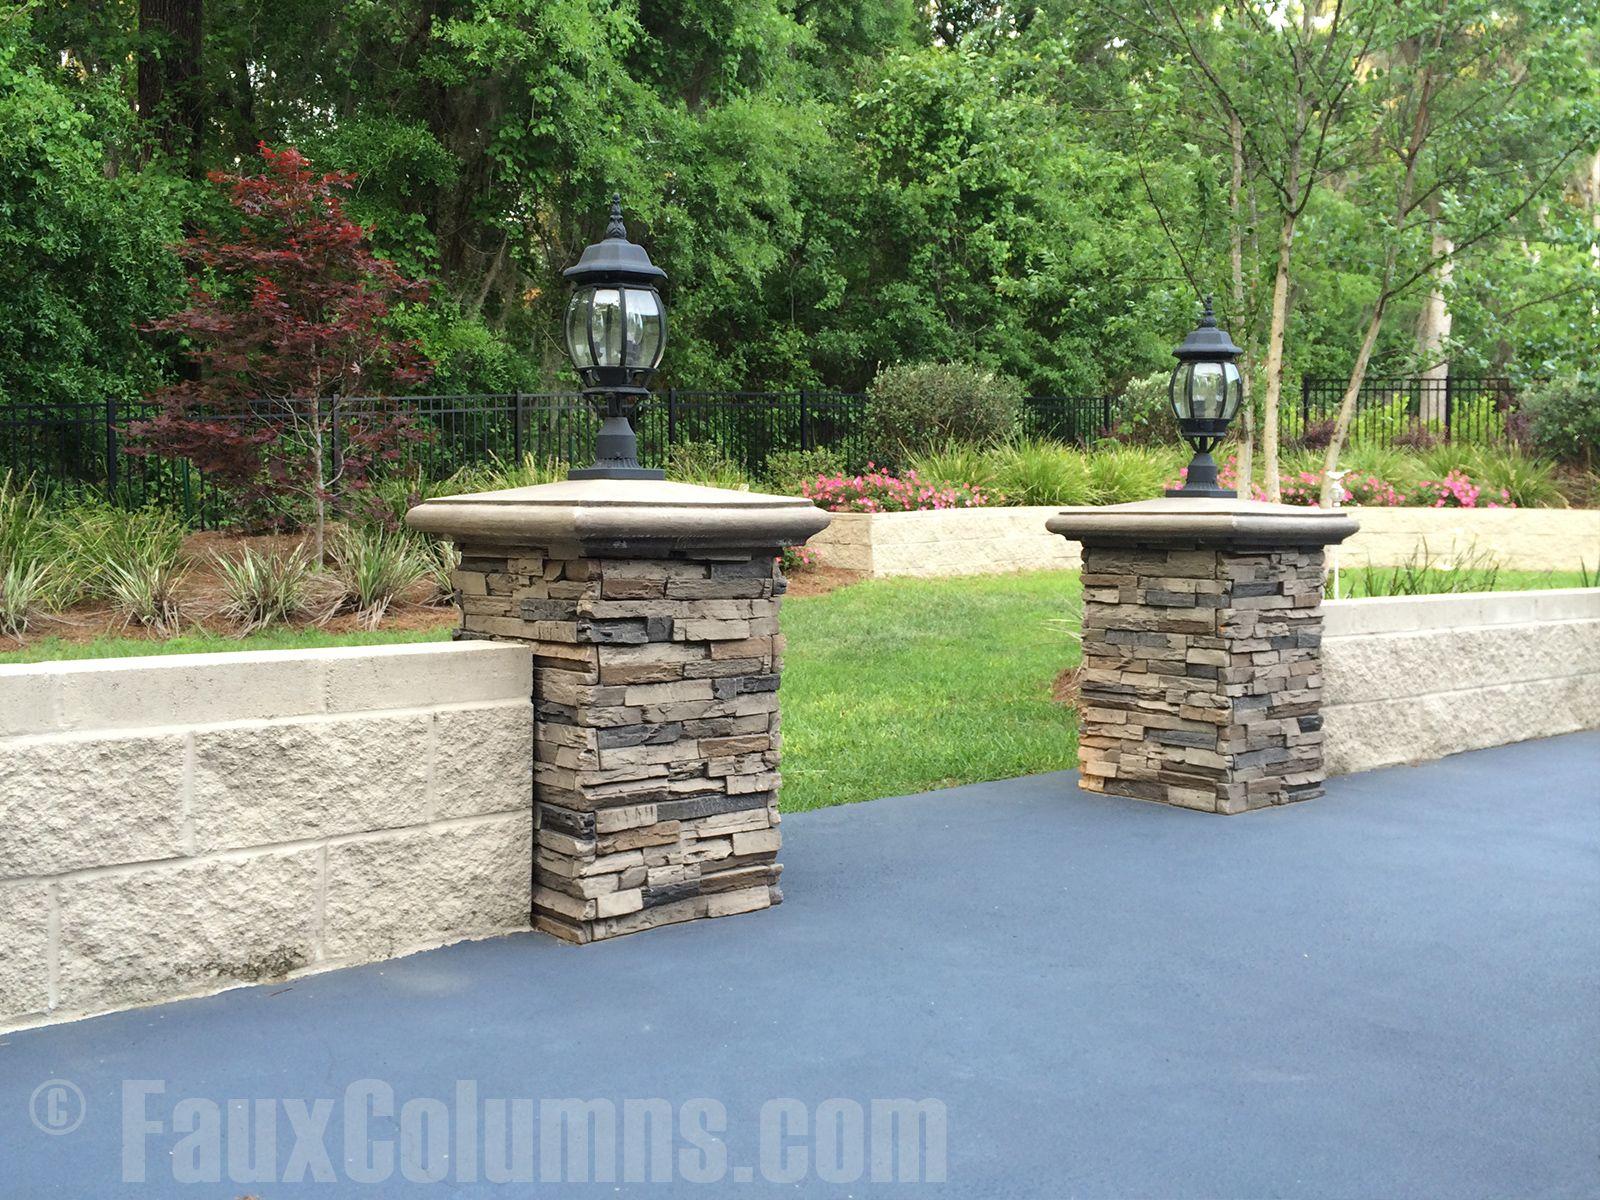 Decorative Column Ideas | Imitation Stone Photo Gallery ... on Fancy Outdoor Living id=27174